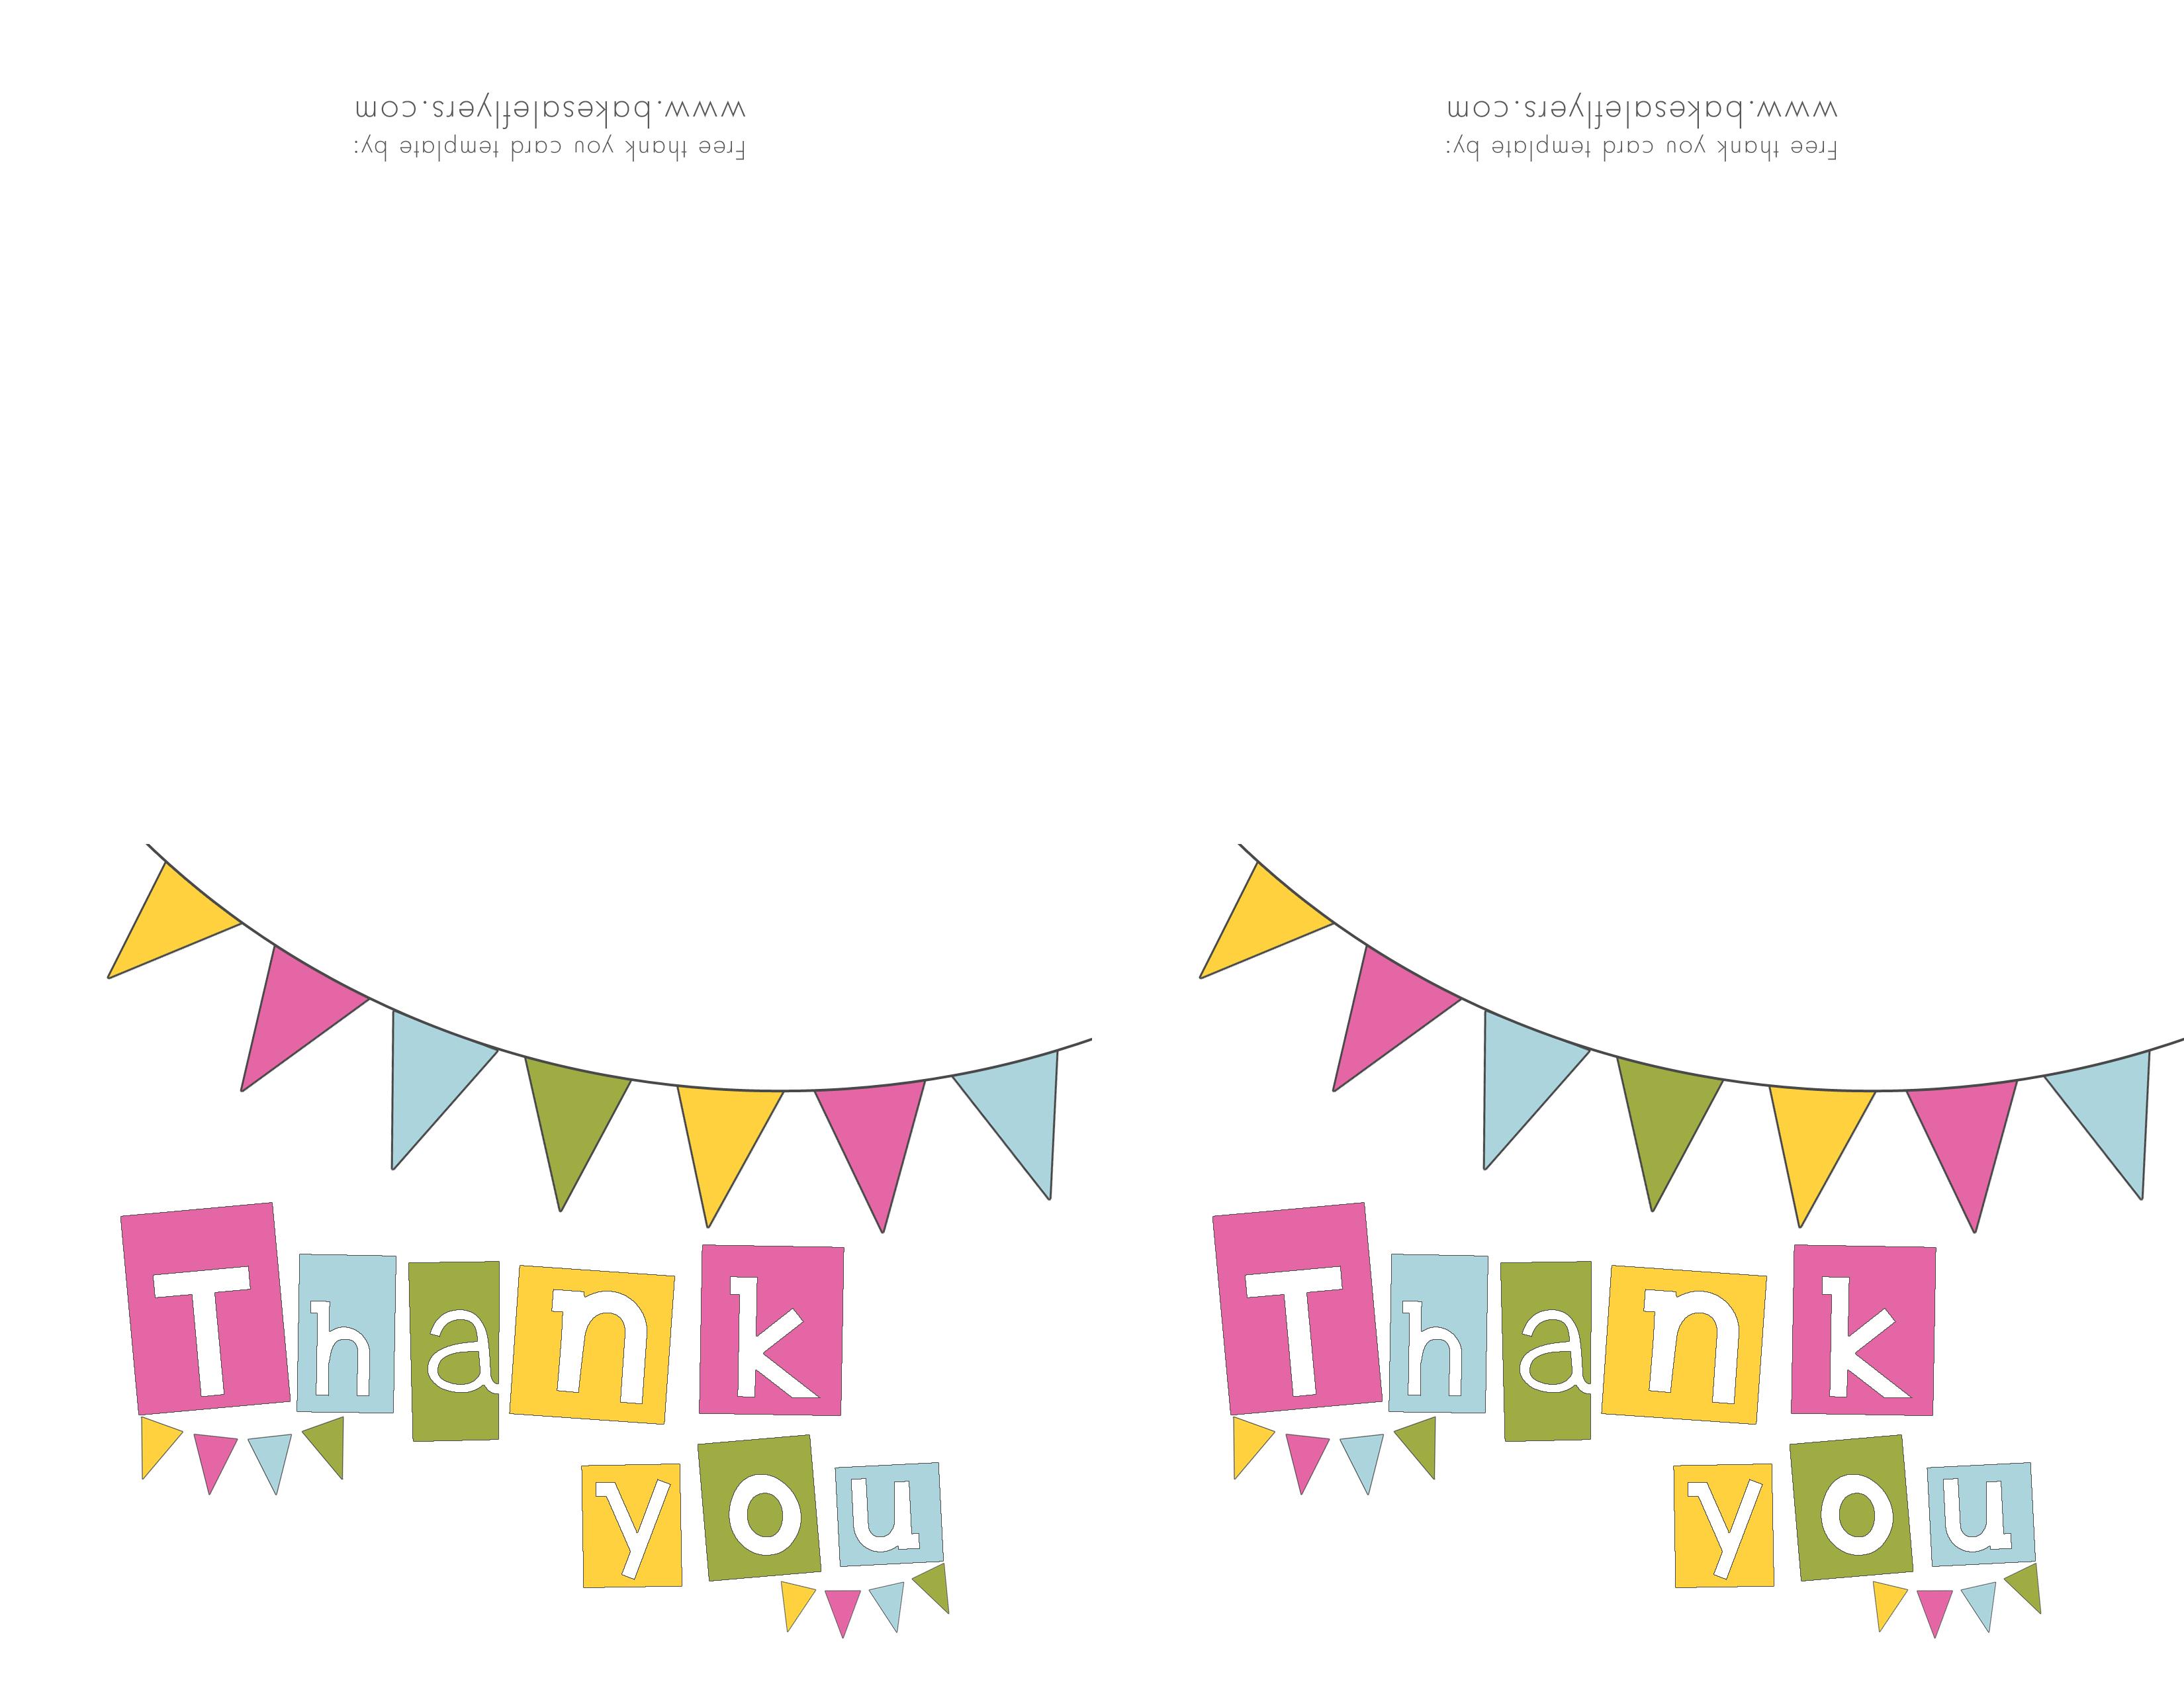 Free Printable Thank You Cards | Bake Sale Flyers – Free Flyer Designs - Free Printable Thank You Cards